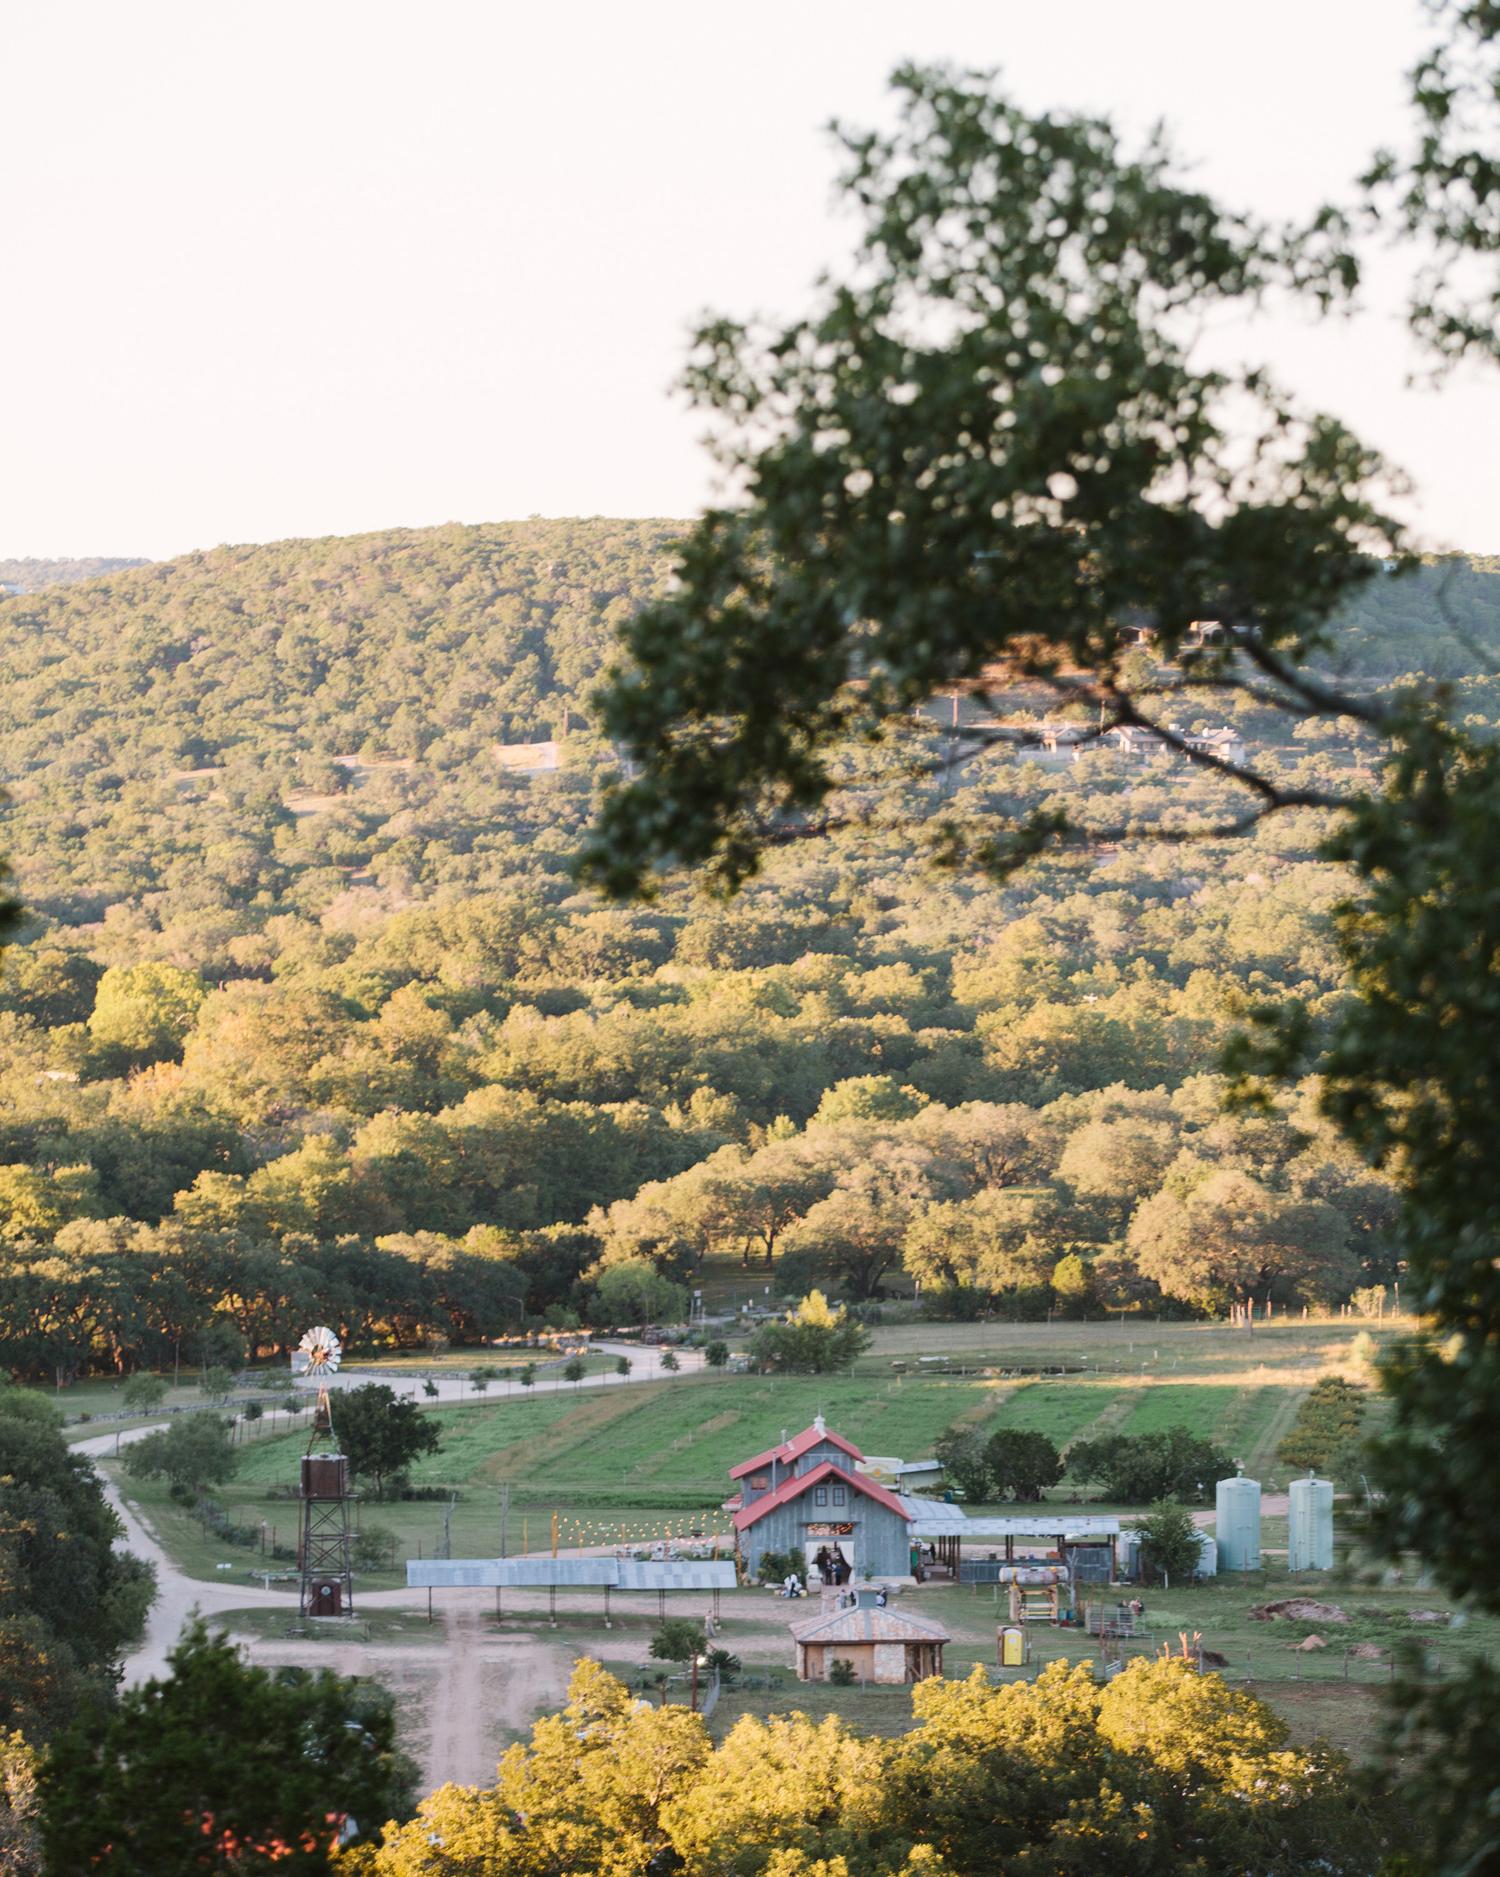 rustic-wedding-handbook-venues-montesino-ranch-view-of-property-0914.jpg